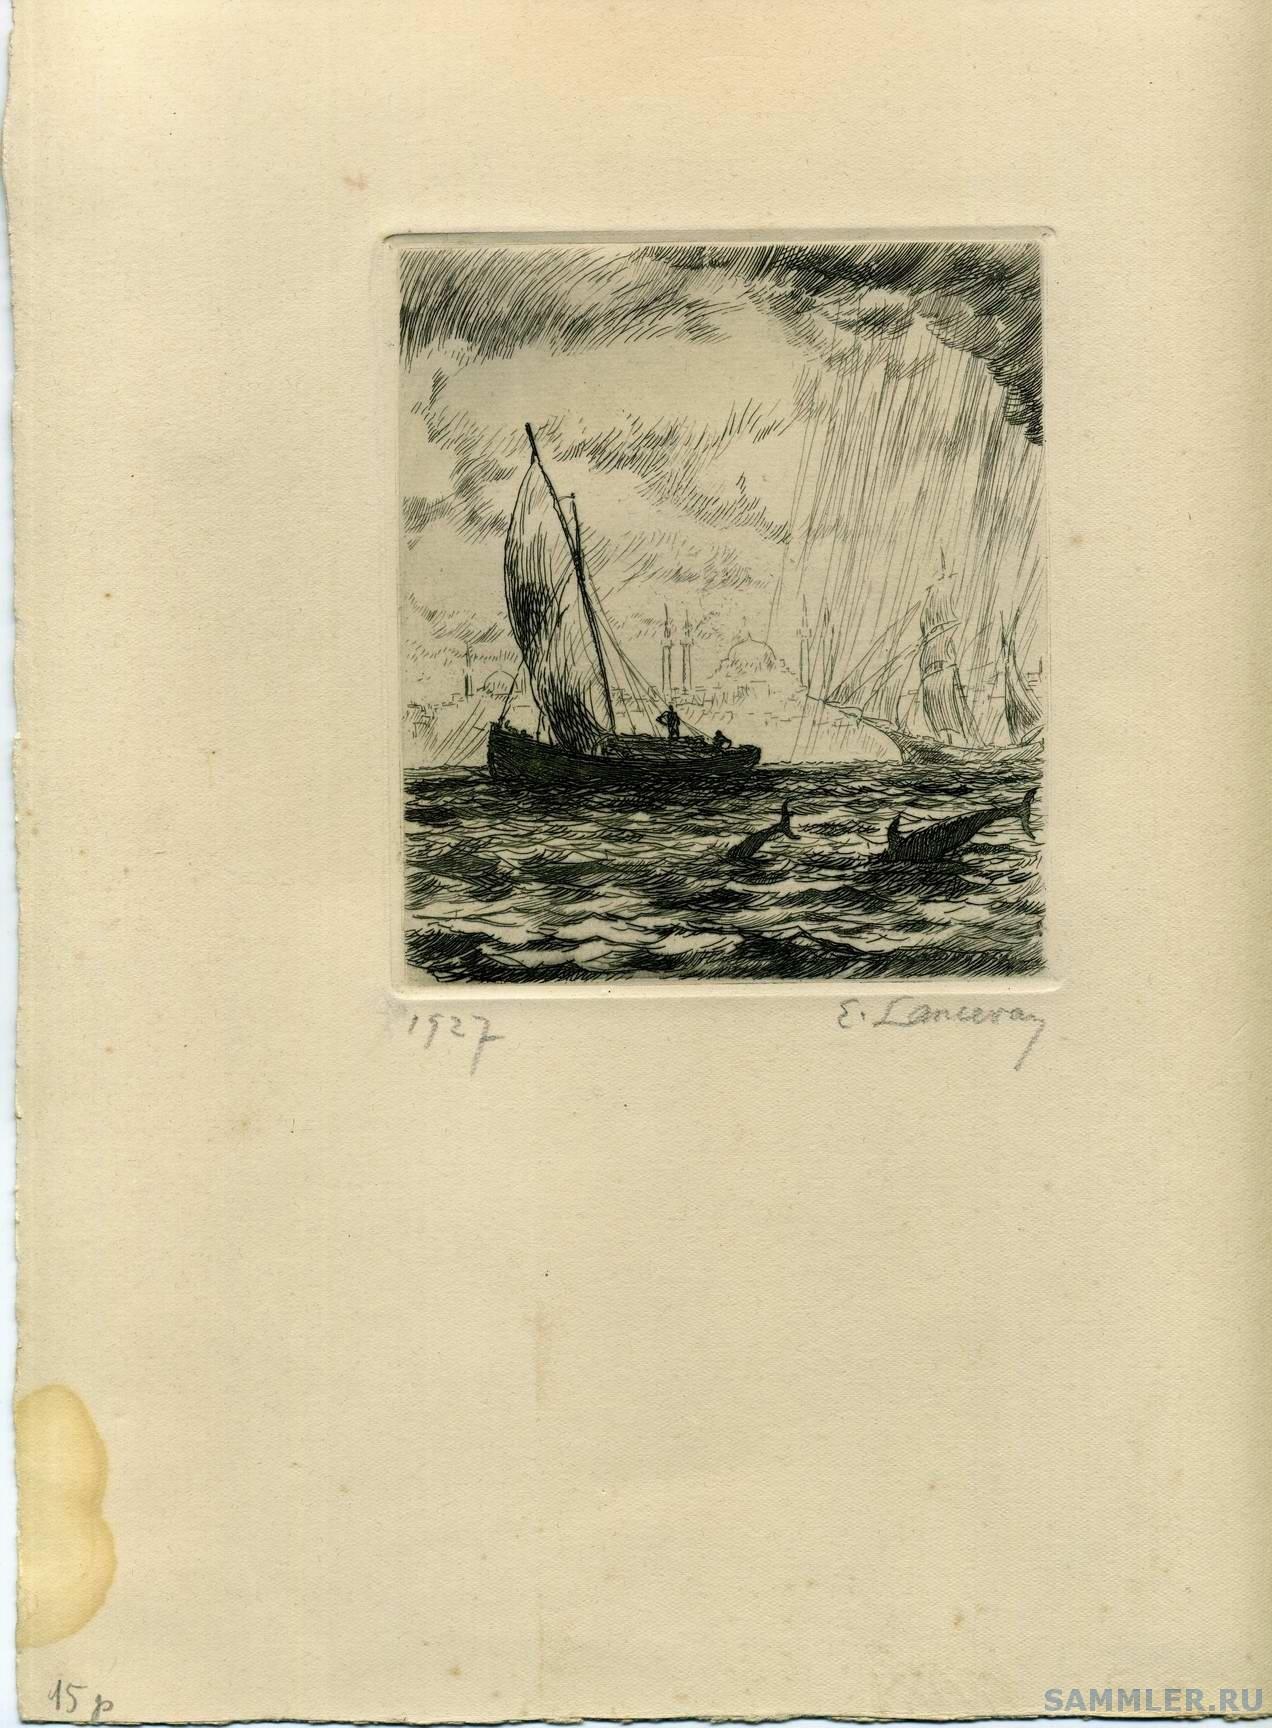 1927 Лансере 03a.jpg